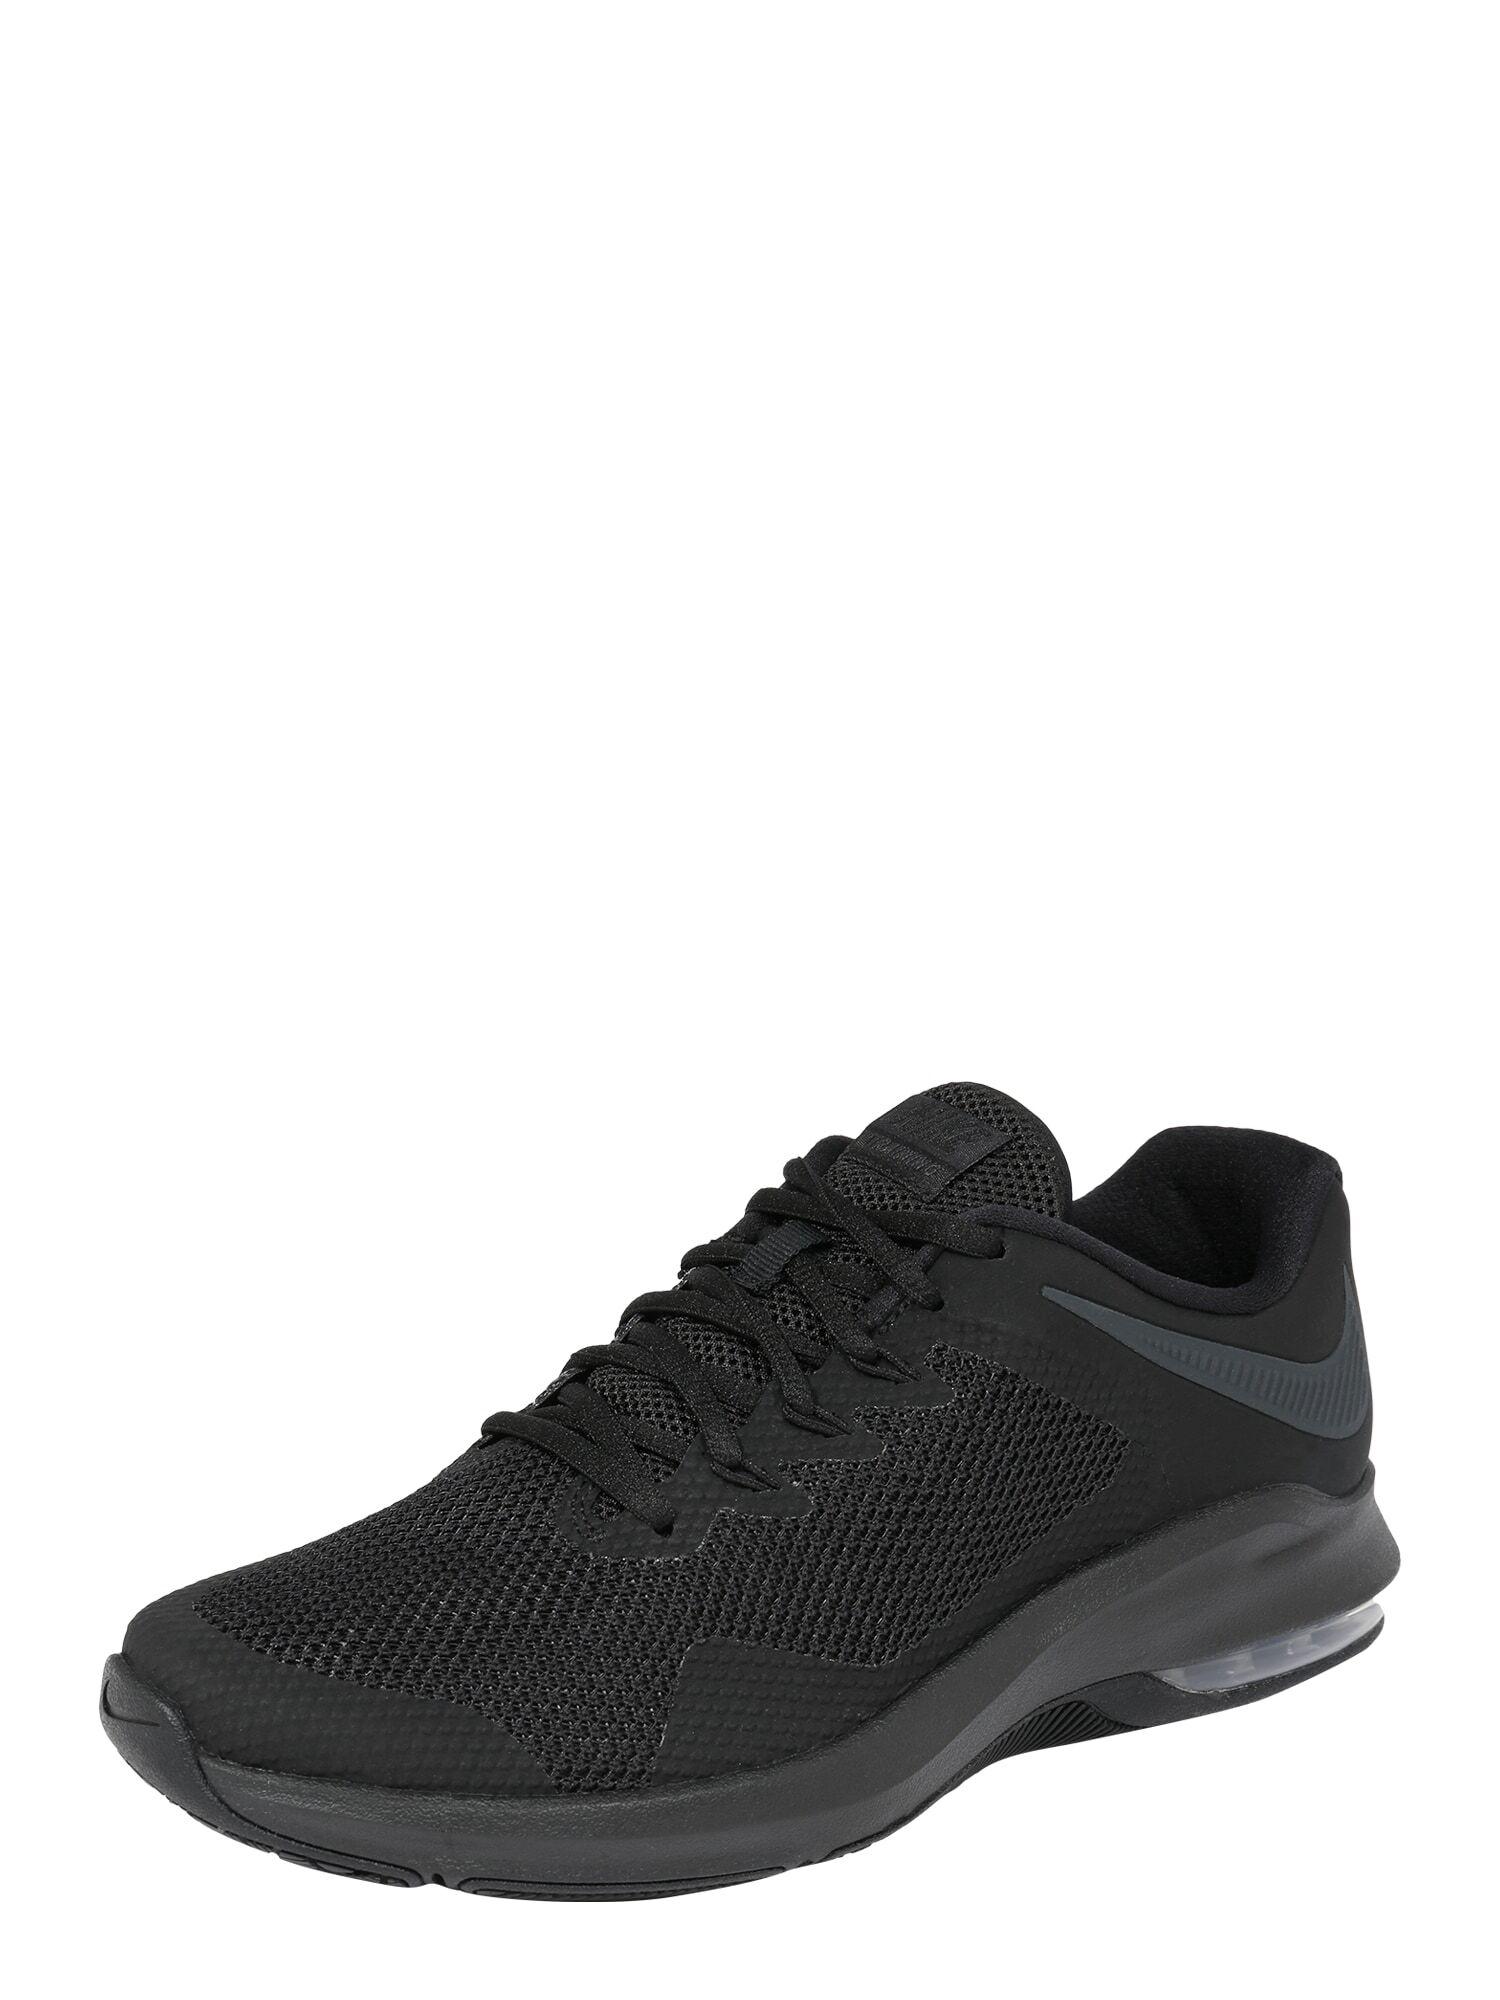 NIKE Chaussure de sport 'Alpha Trainer'  - Noir - Taille: 11 - male